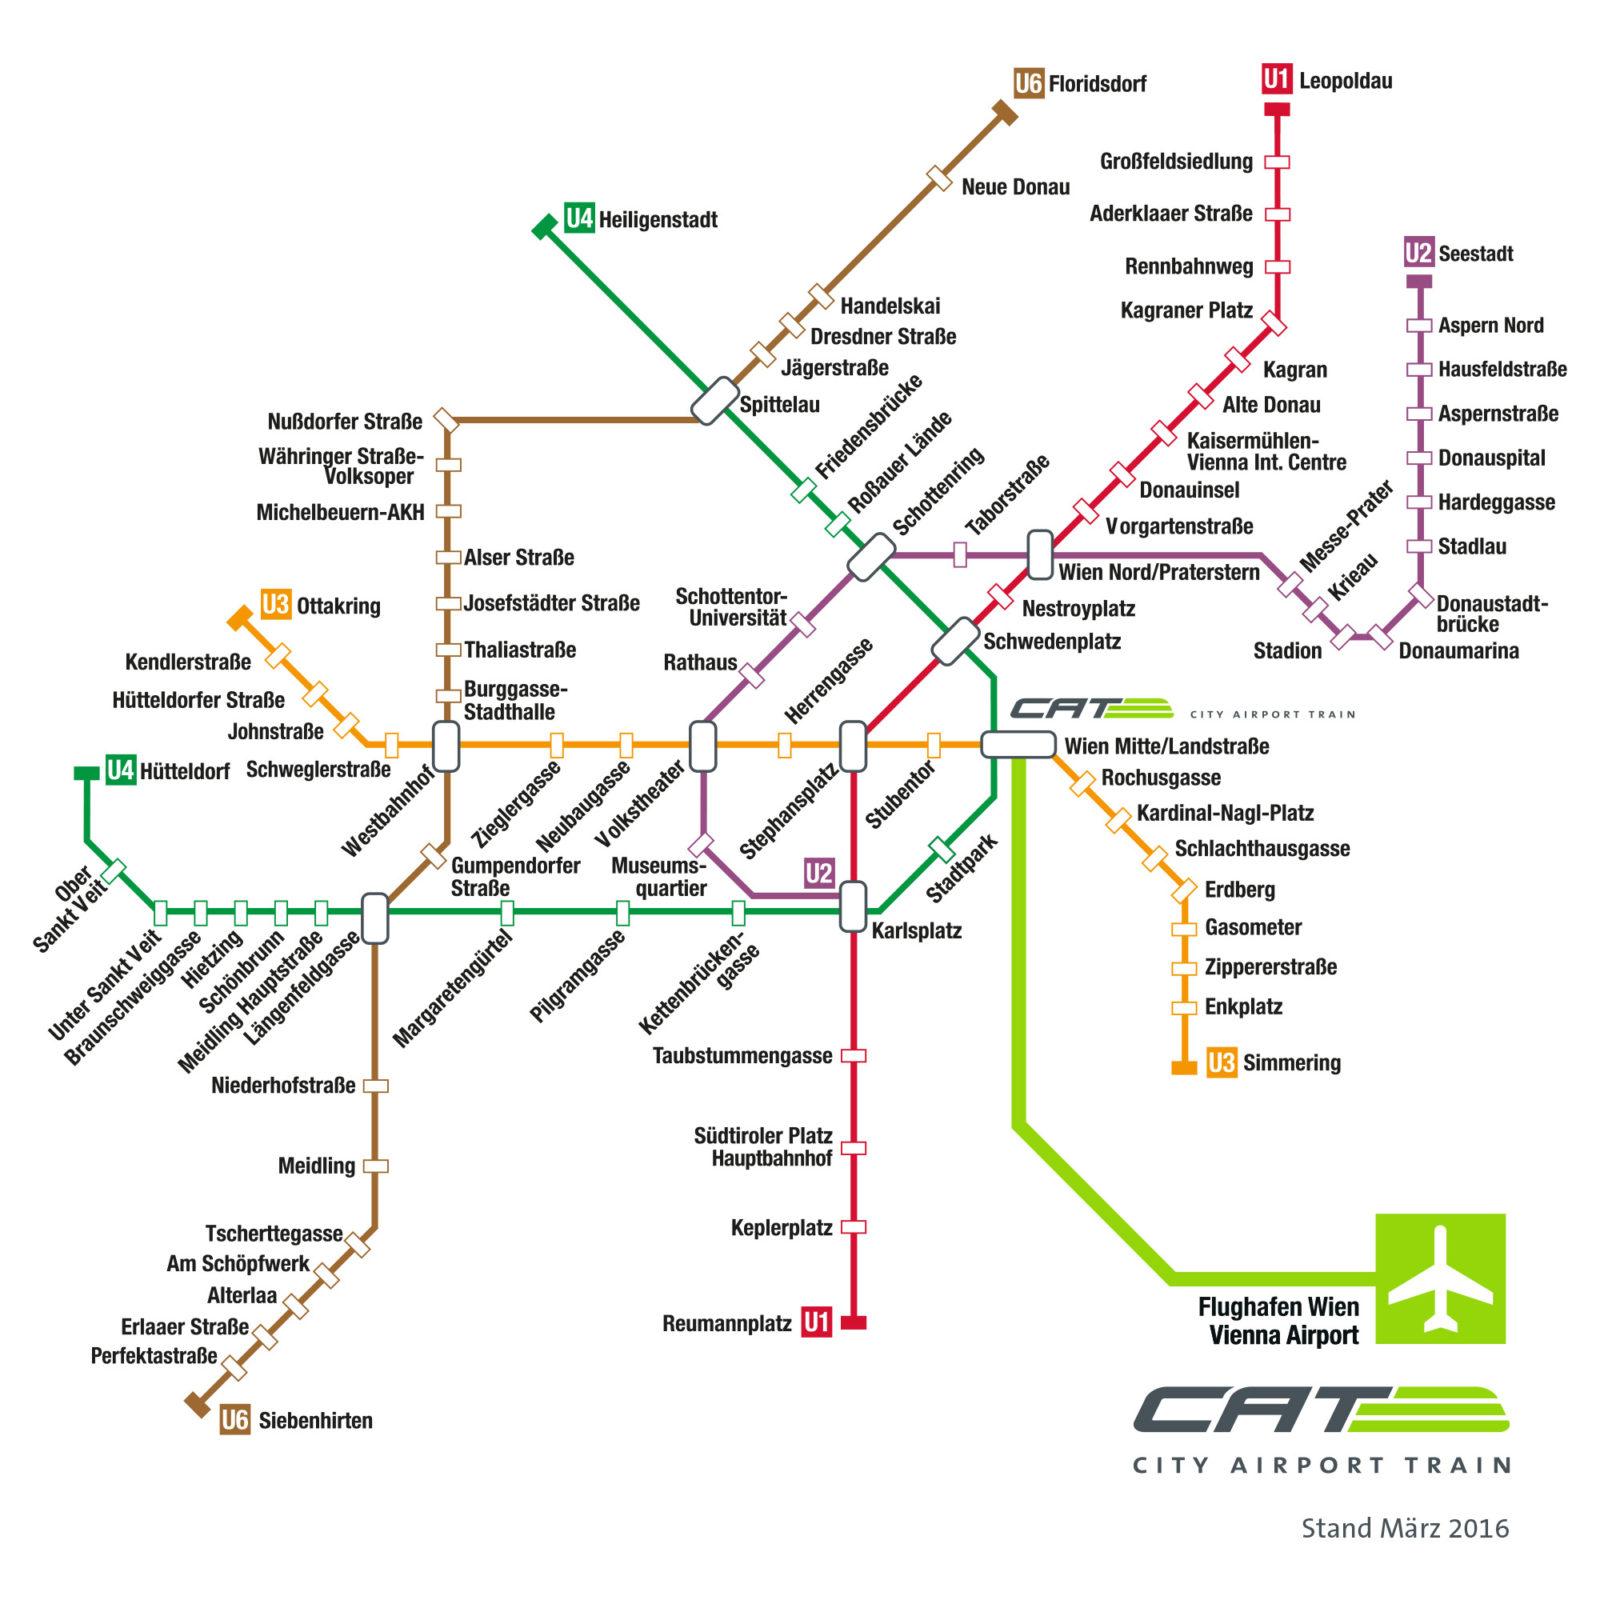 Schema de circulație al Aeroexpress-ului CAT